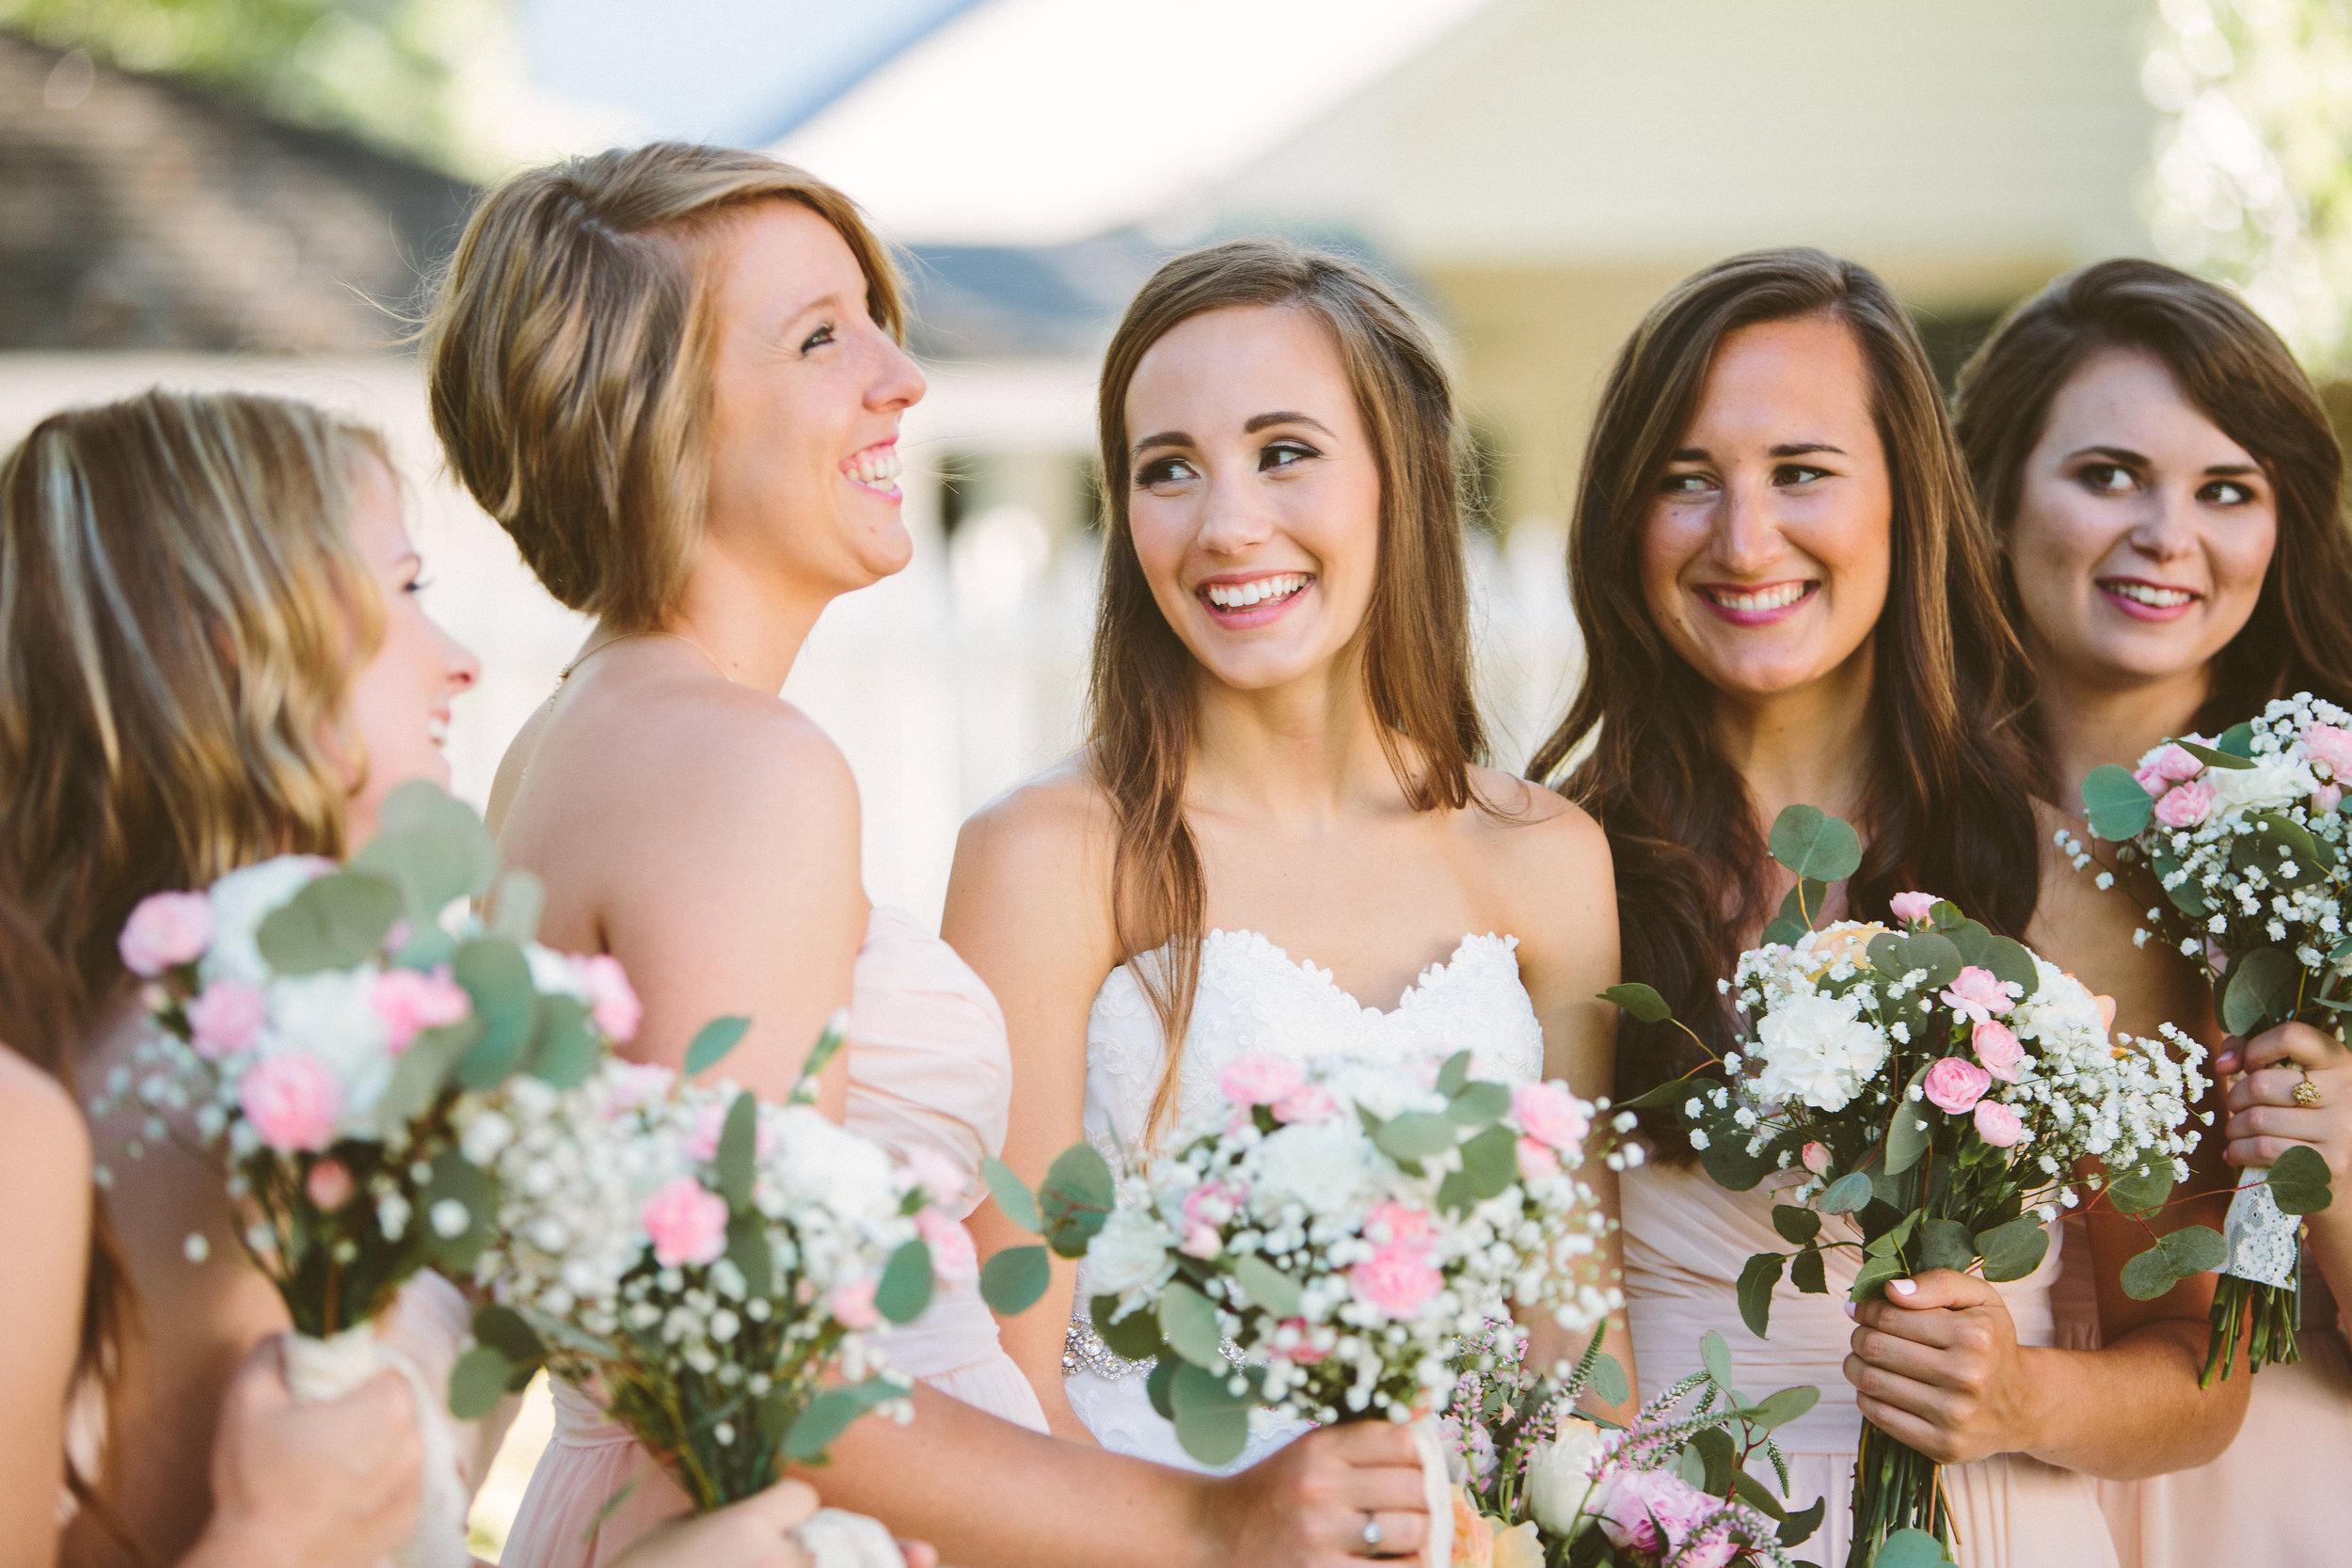 0416_short_wedding - Copy.jpg